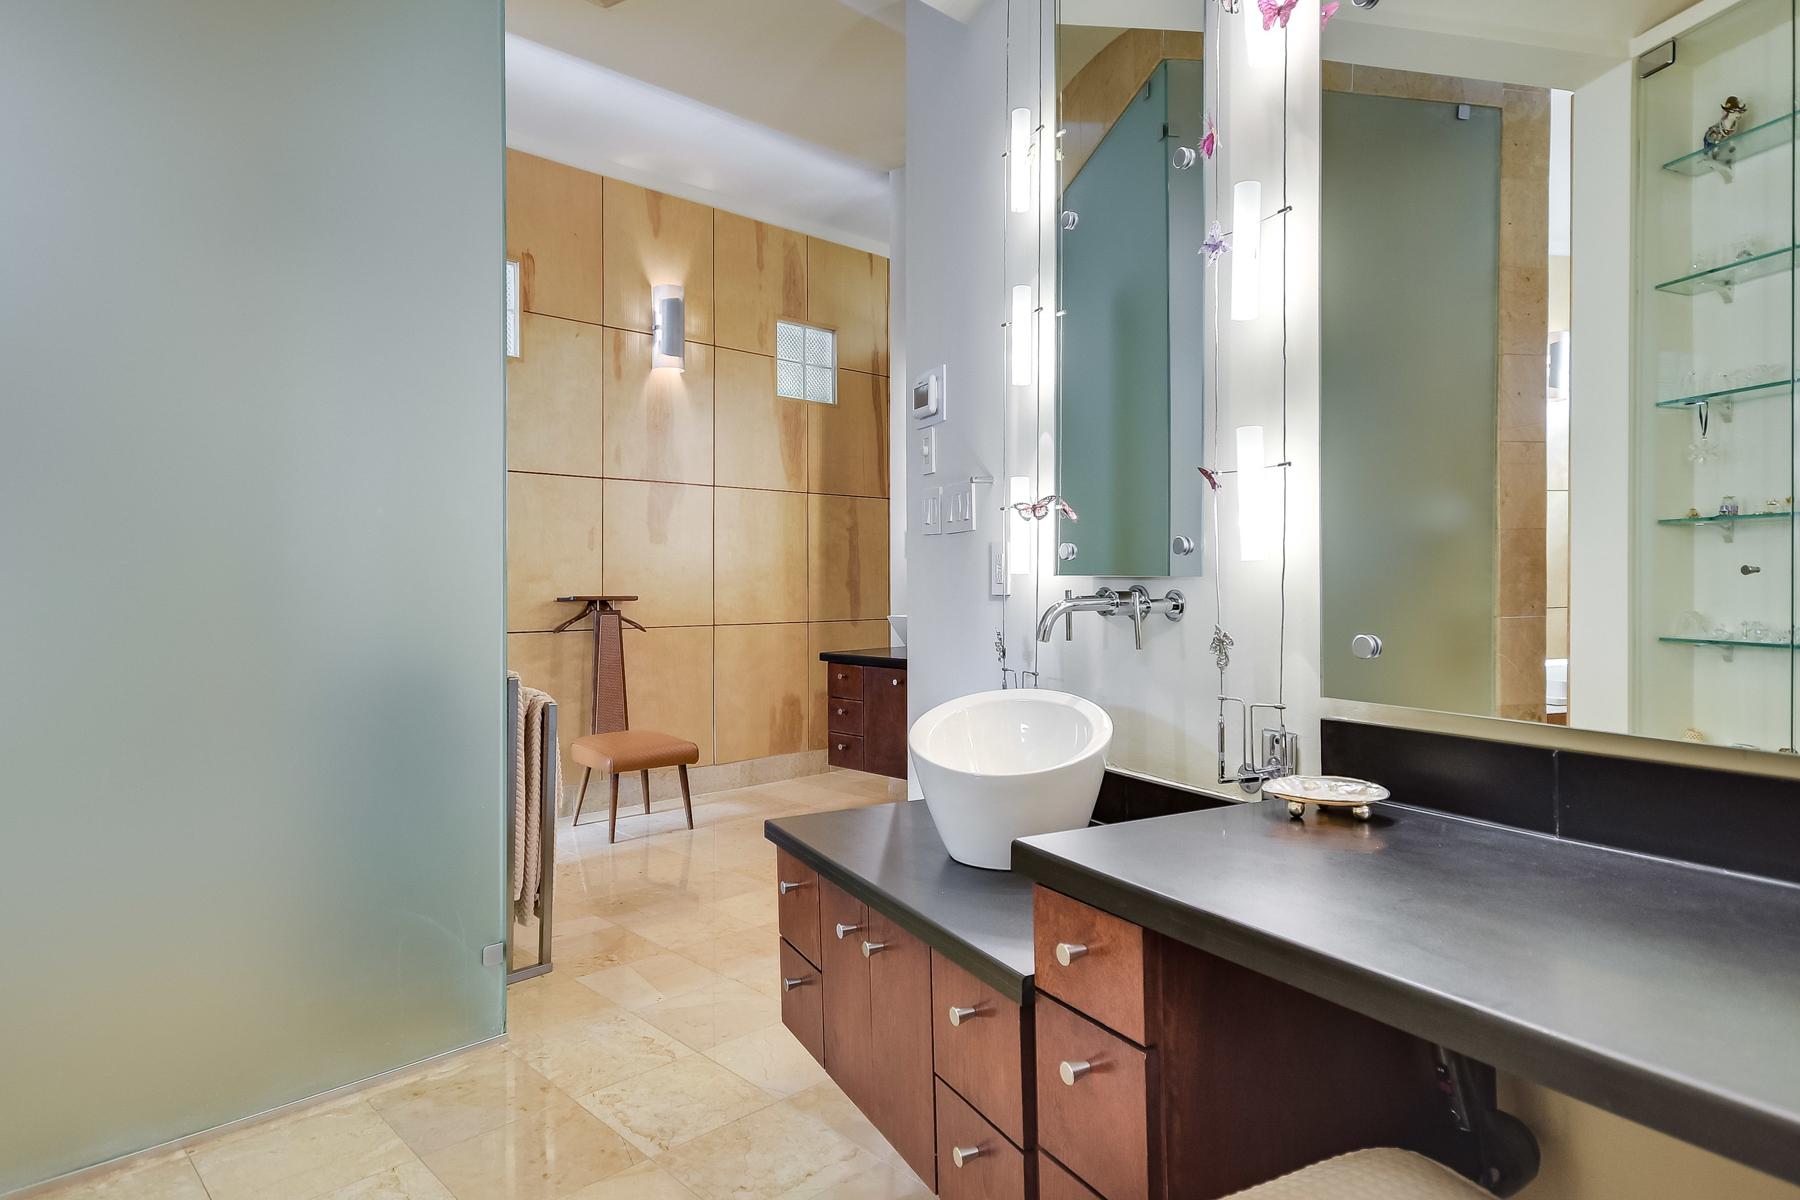 Additional photo for property listing at Contemporary Masterpiece in Oak Hills Park Estates 23 Oak Hill Pl San Antonio, Texas 78229 Estados Unidos